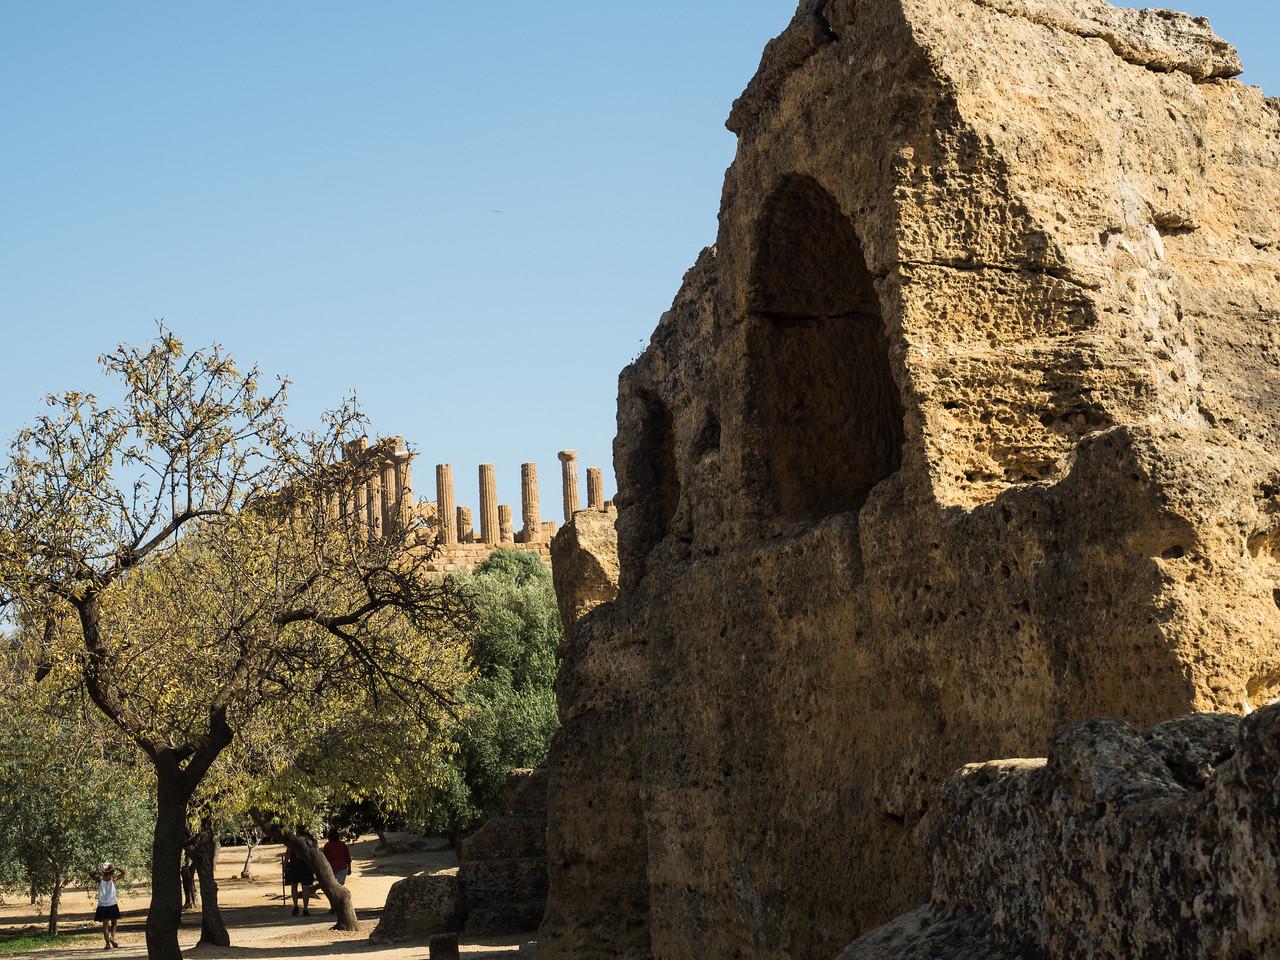 The temple of Juno (Hera Lakinia)  in background